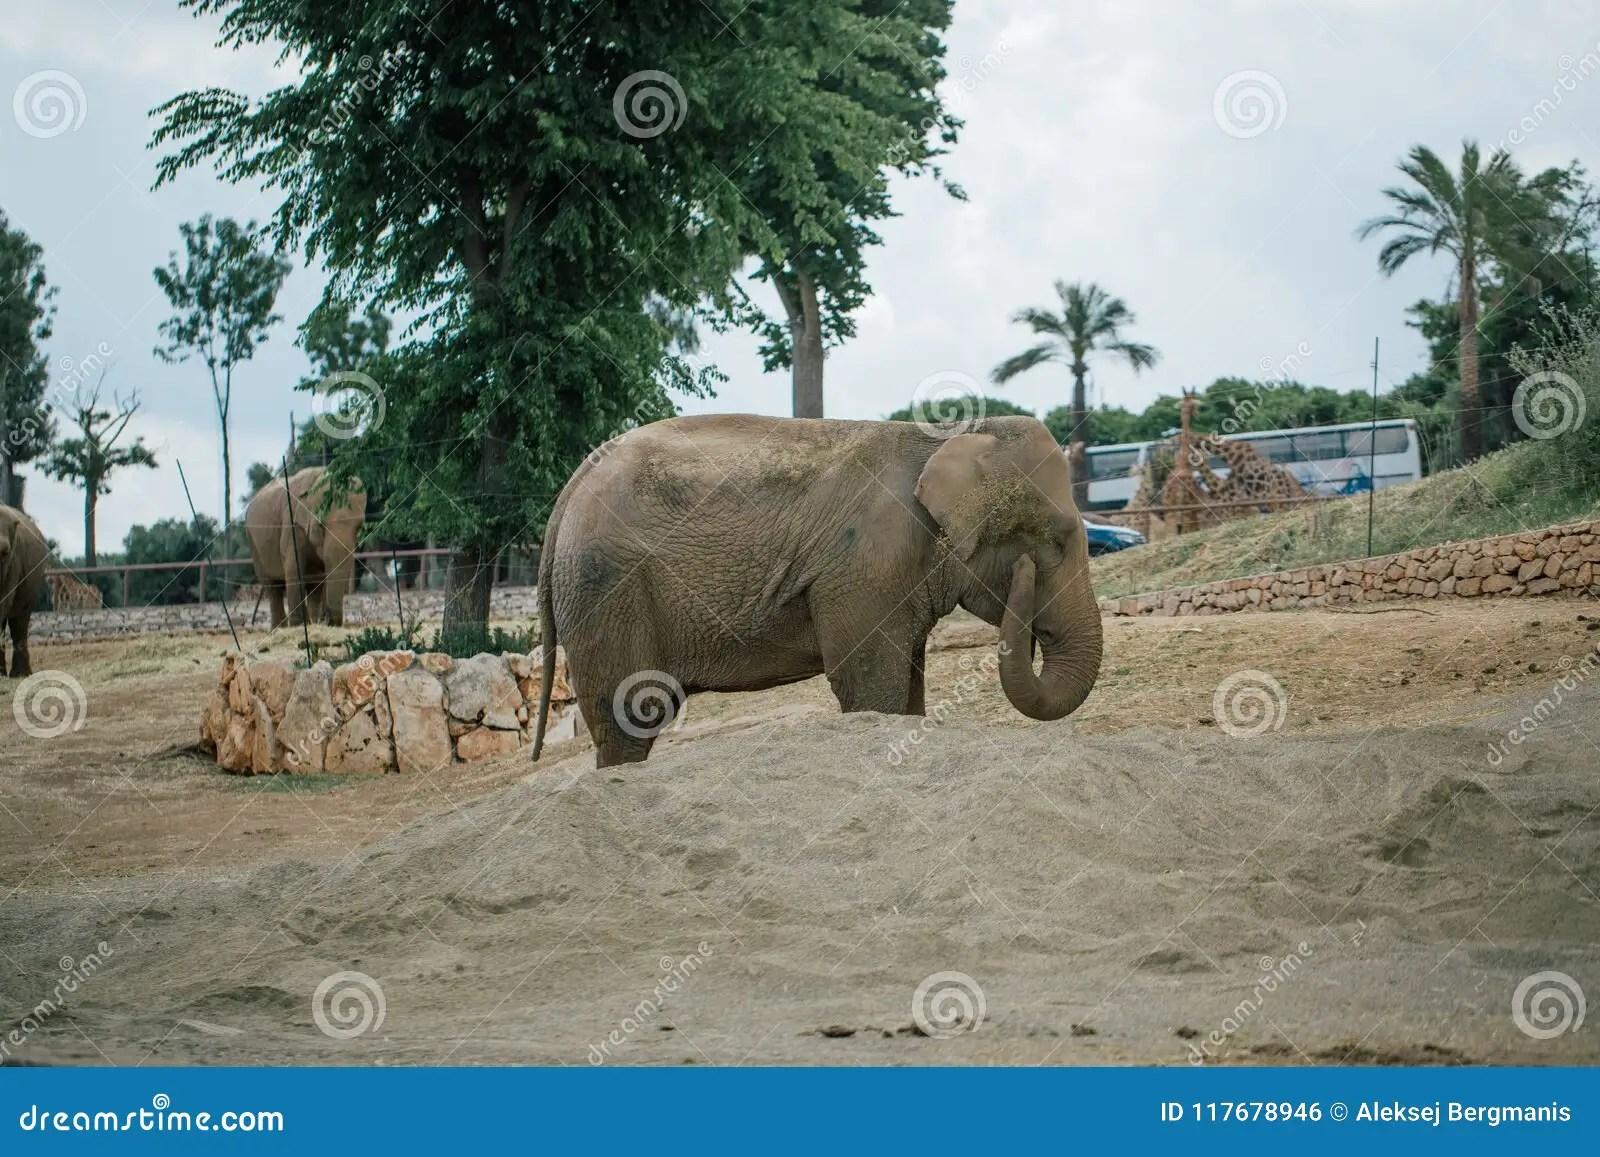 Elephant In Safari Zoo Fasano Apulia Italy Stock Photo - Image of motherprotectingbaby. animal: 117678946